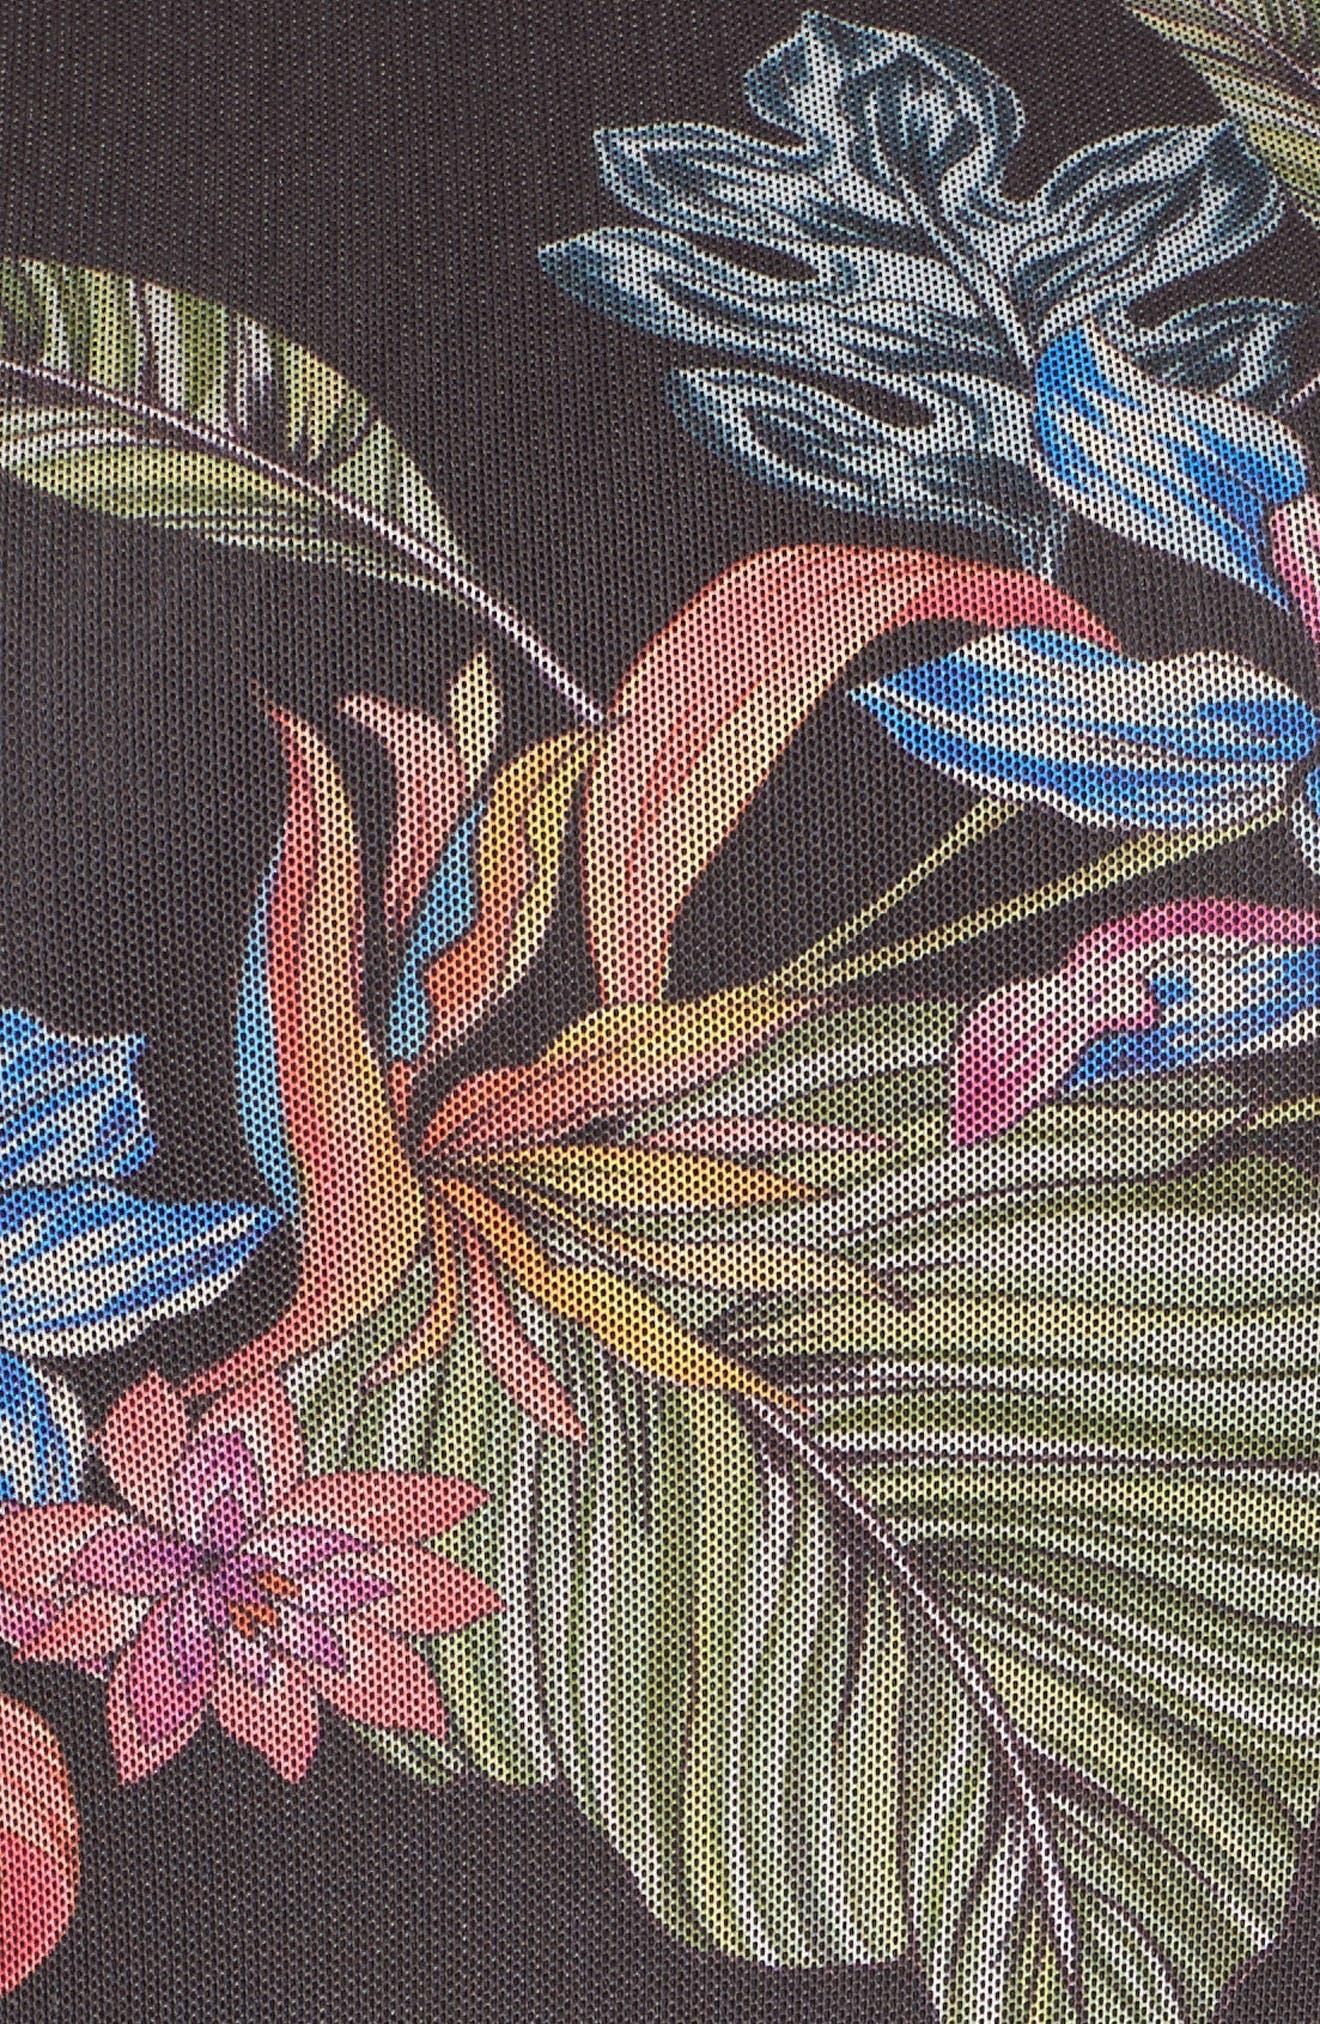 Tropic Print Mesh Dress,                             Alternate thumbnail 5, color,                             Dark Multi